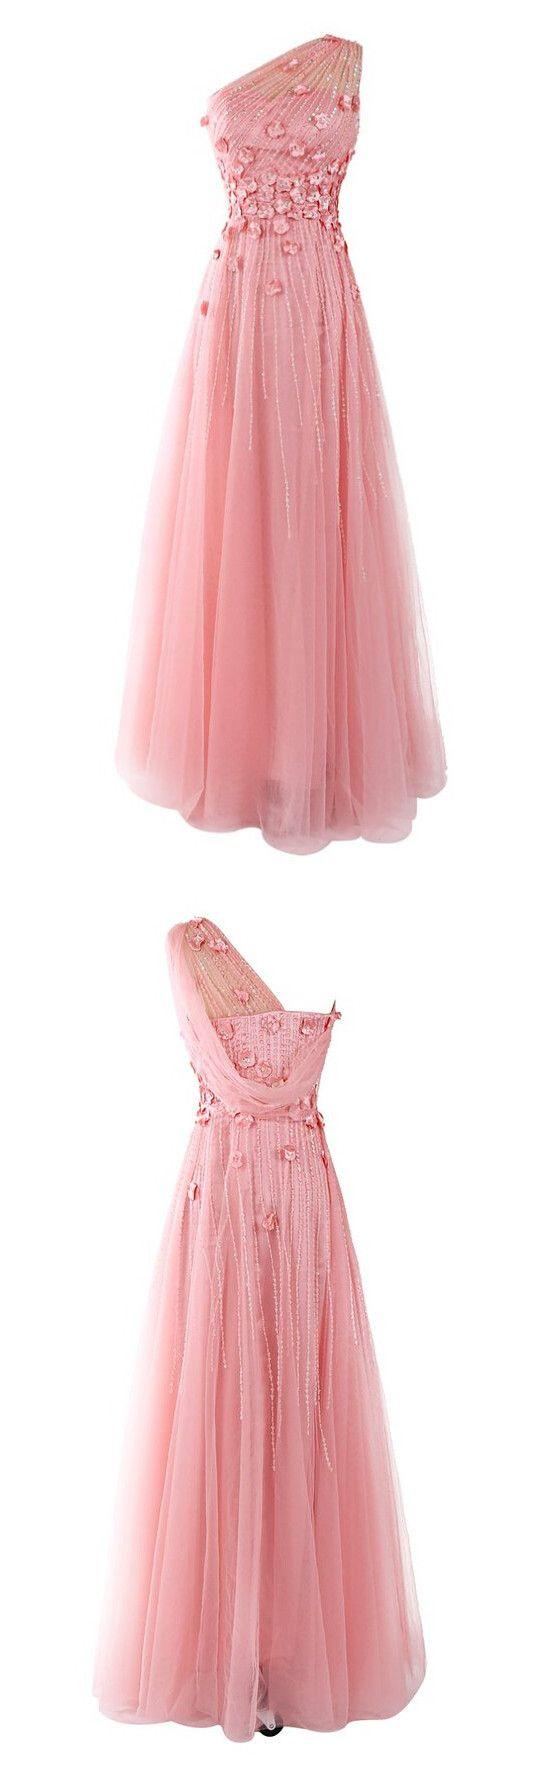 One Shoulder Beading Prom Dress,Long Prom Dresses,Charming Prom ...